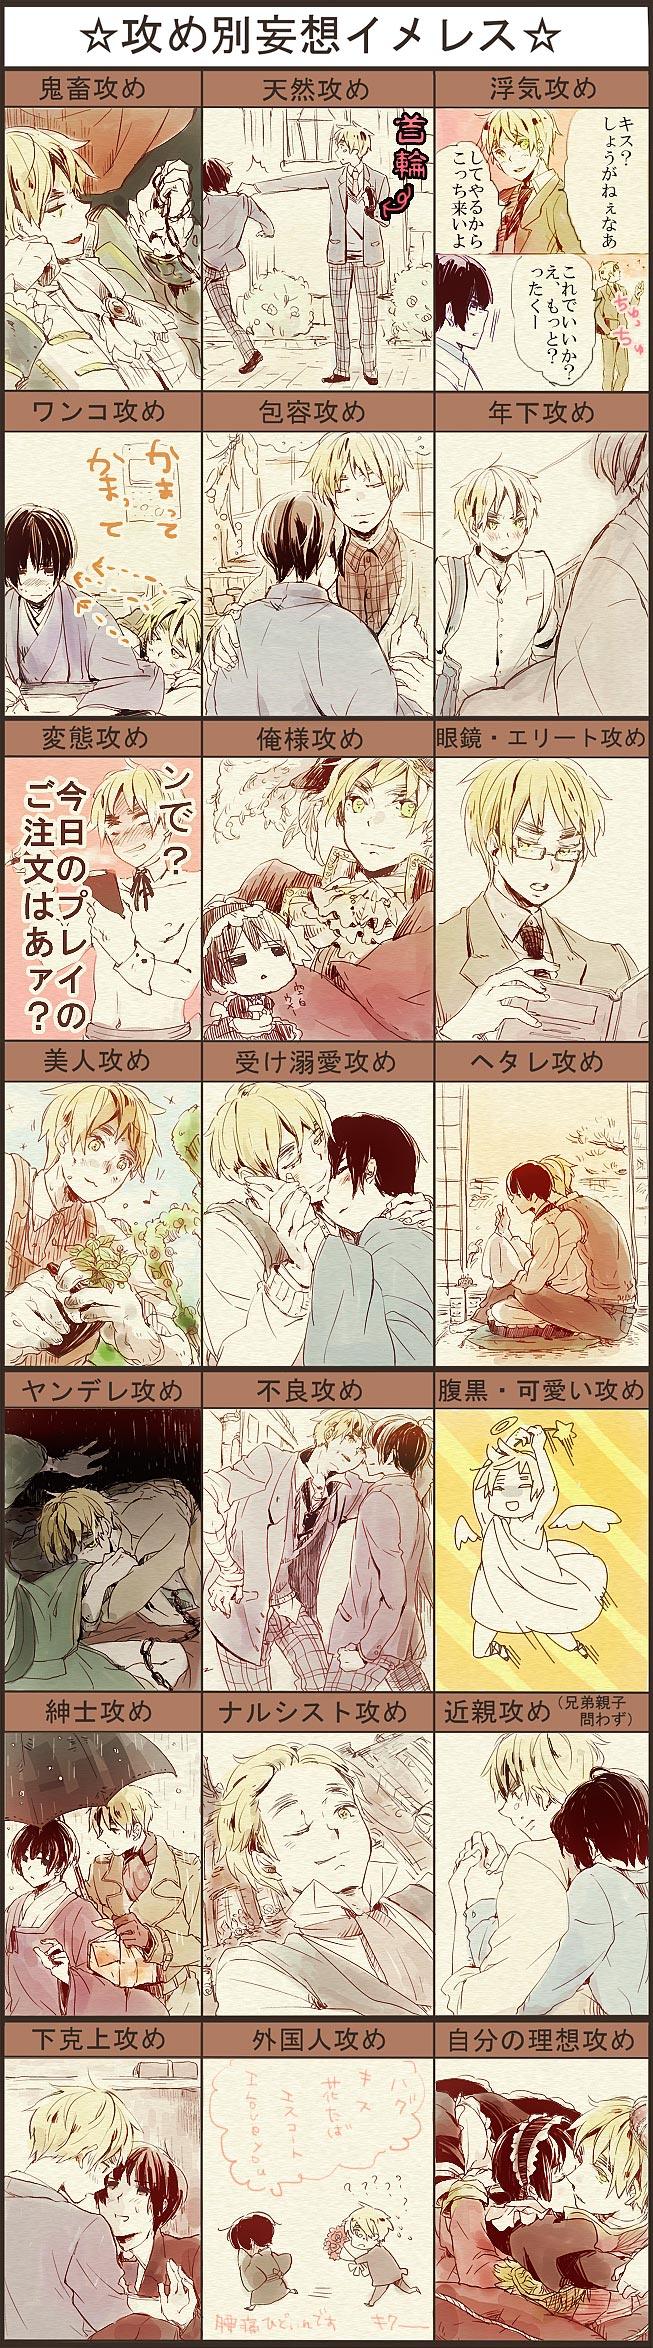 Tags: Anime, Pixiv Id 271017, Axis Powers: Hetalia, Britannia Angel, United Kingdom, Japan, Sexy Waiter, Toga, Star Wand, Fanart, Pixiv, Gakuen Hetalia, Asian Countries